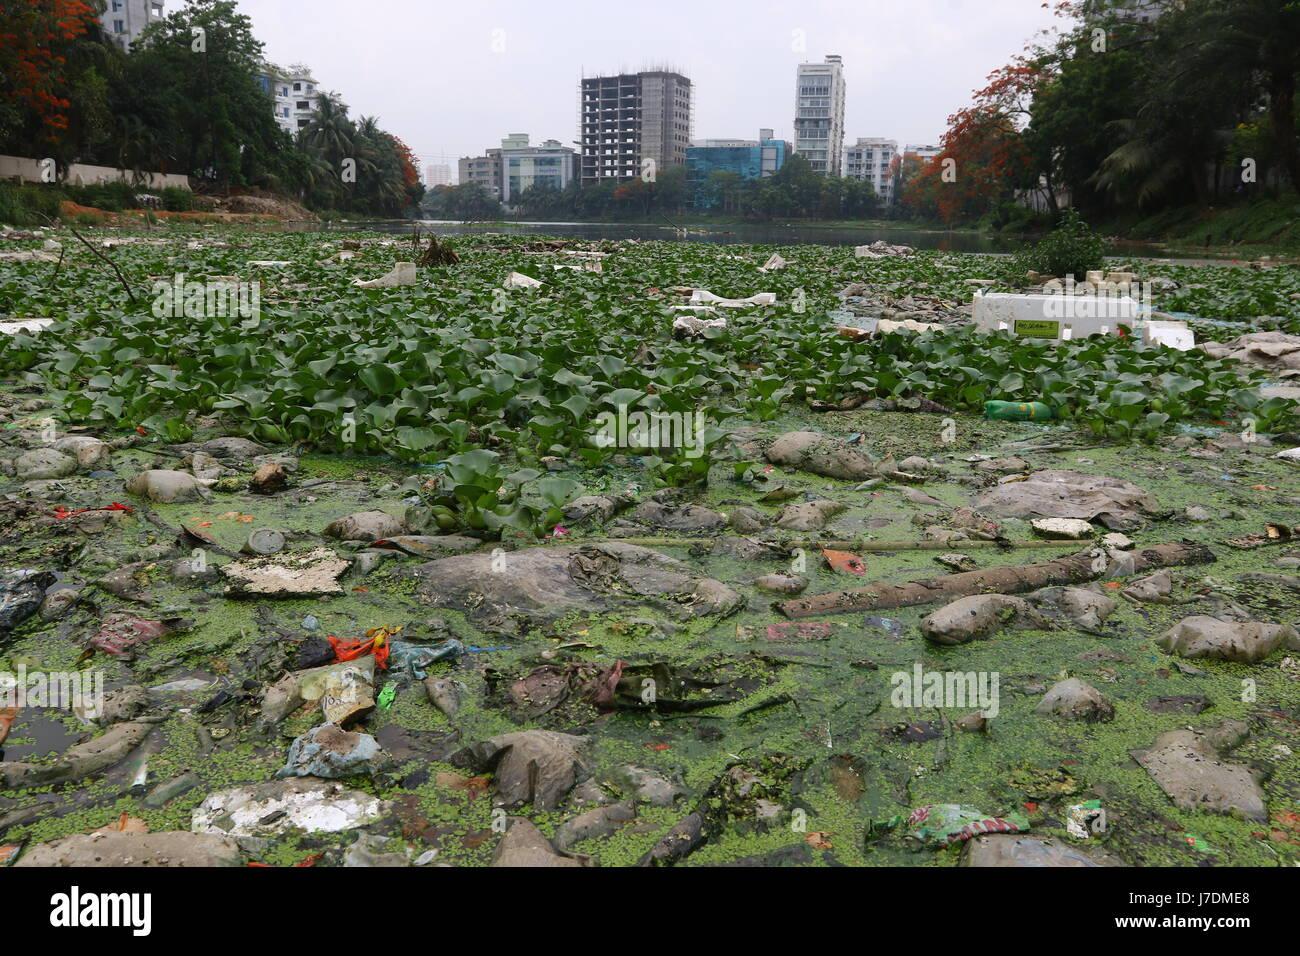 Dhaka 20 may 2017. Dhaka gulshan lake pollution shows water contamination in Gulshan Lake is getting worse as hazardous - Stock Image